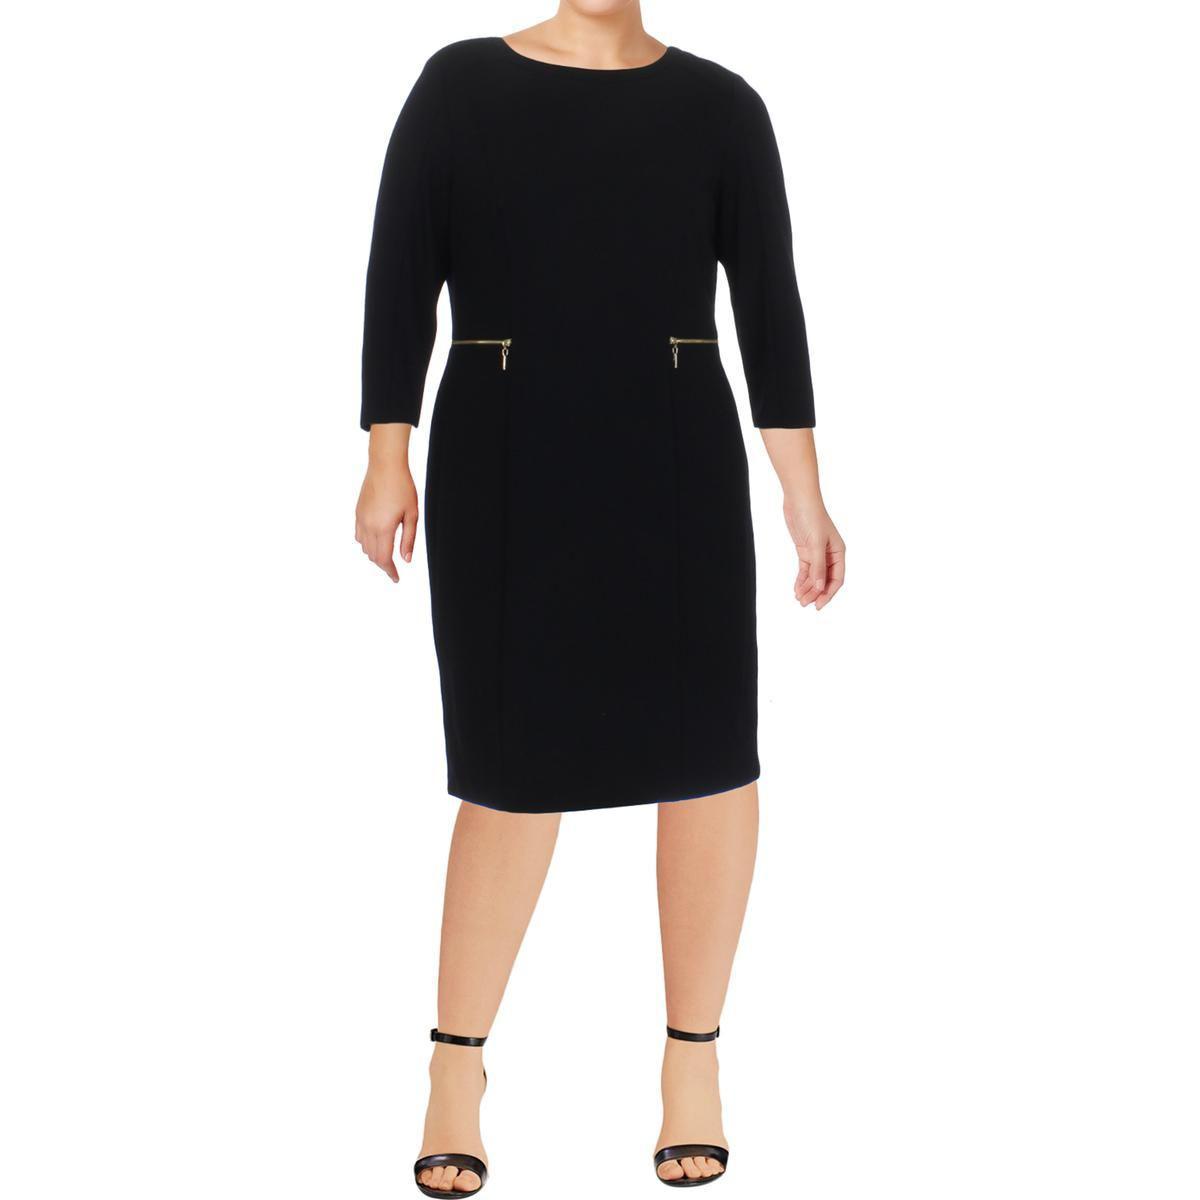 0bb3b4ceb1 Lyst - Nine West Womens Ponte Knit 3 4 Sleeves Wear To Work Dress in ...